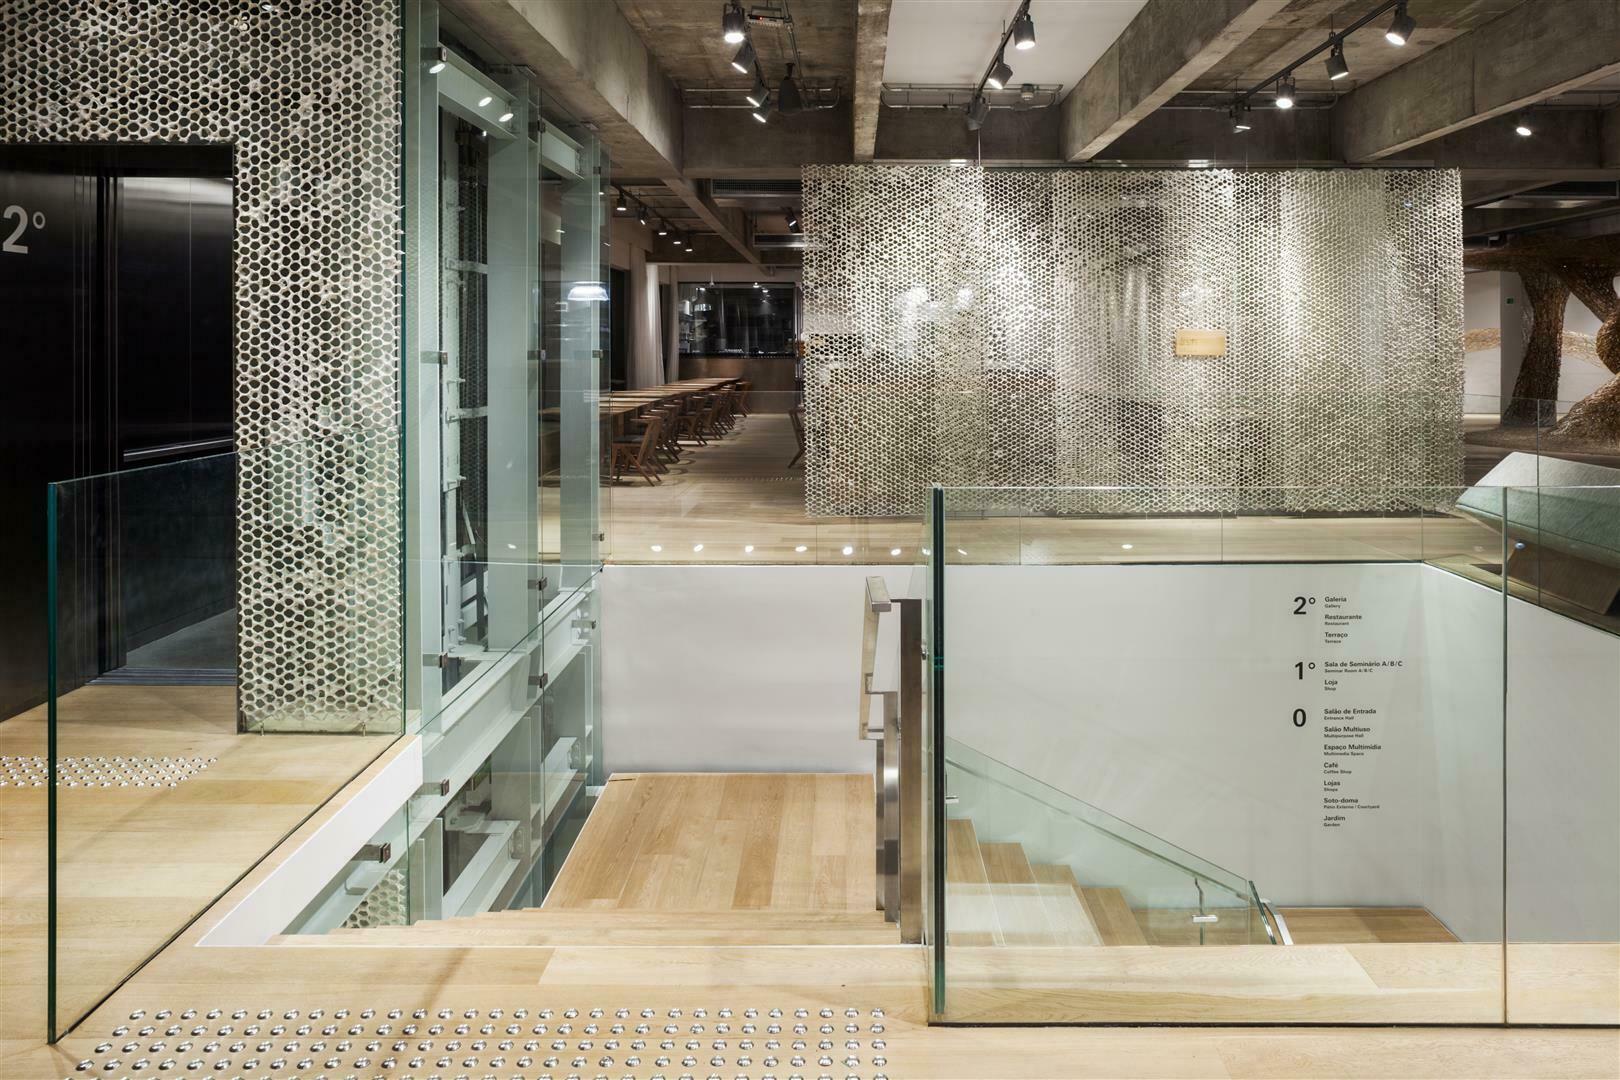 JAPAN HOUSE Kengo Kuma - Japan House recebe prêmio Prix Versailles